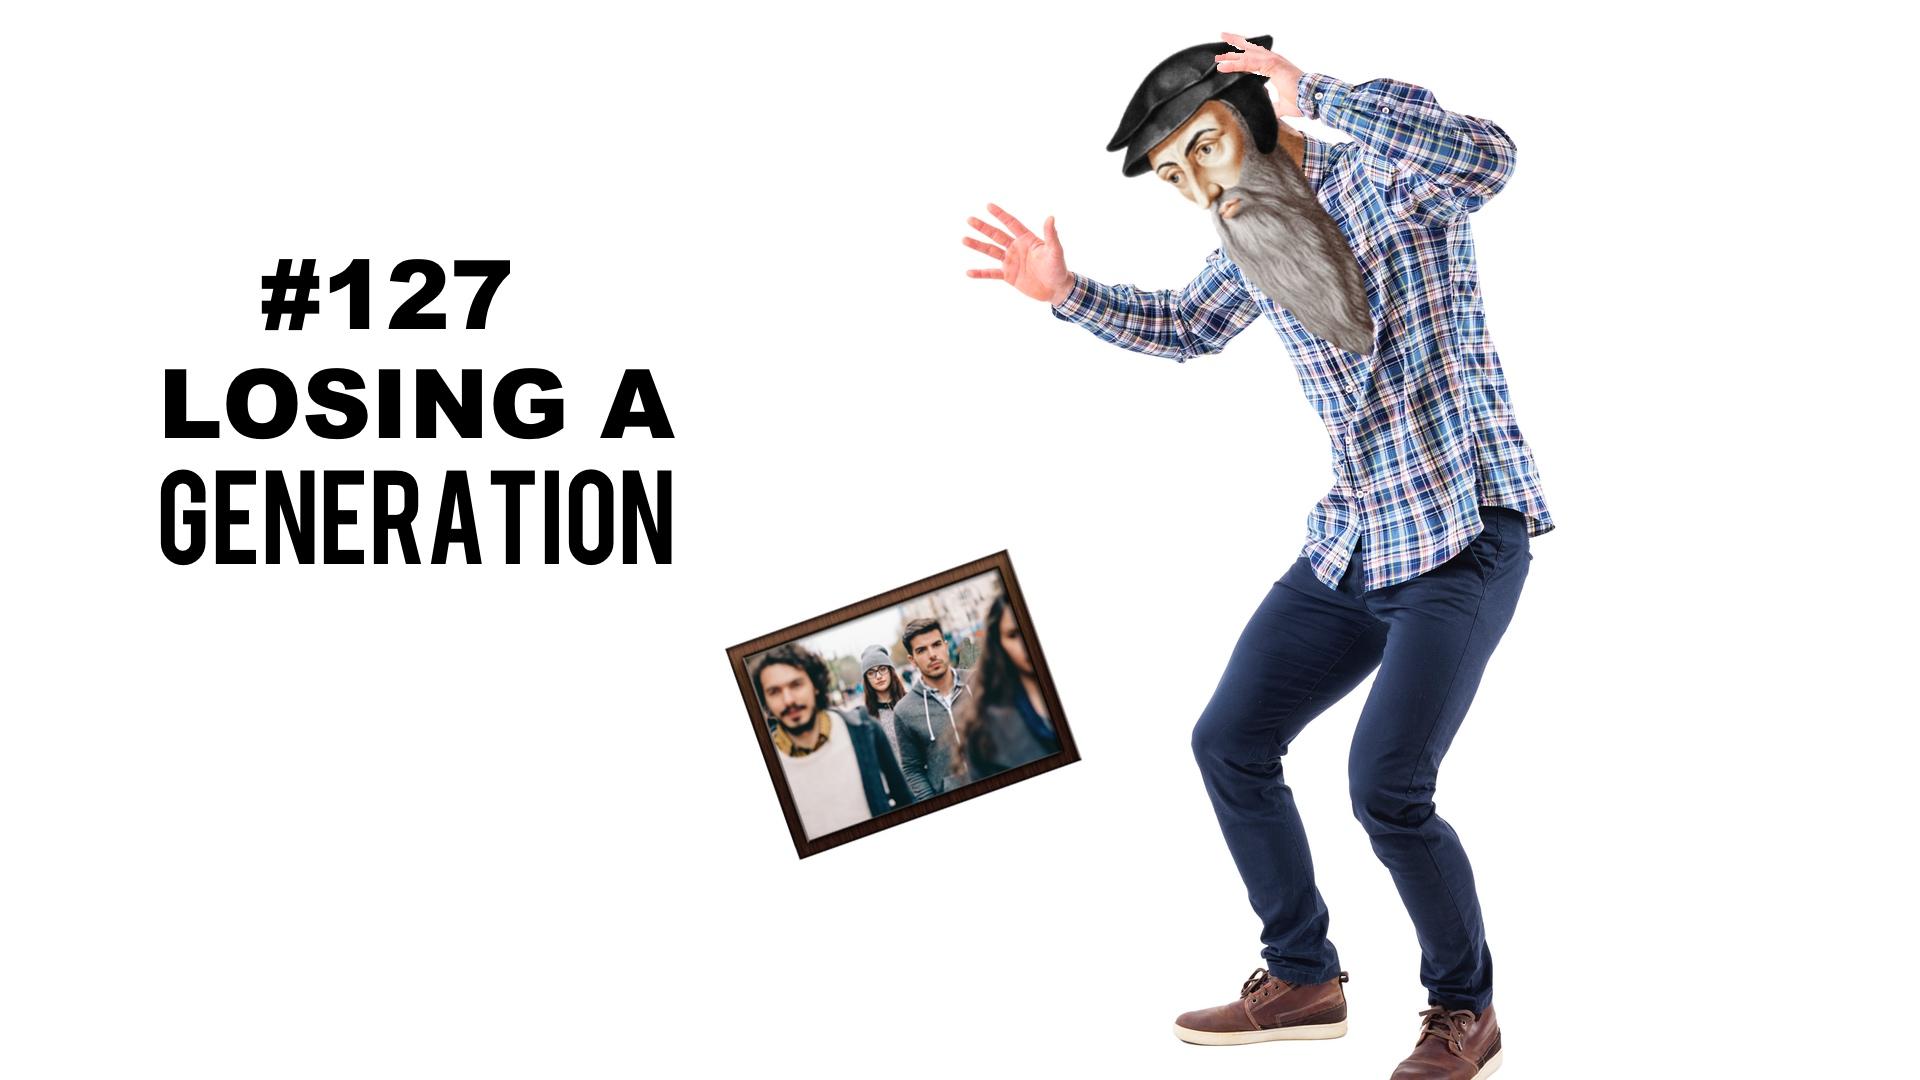 #127 Losing A Generation